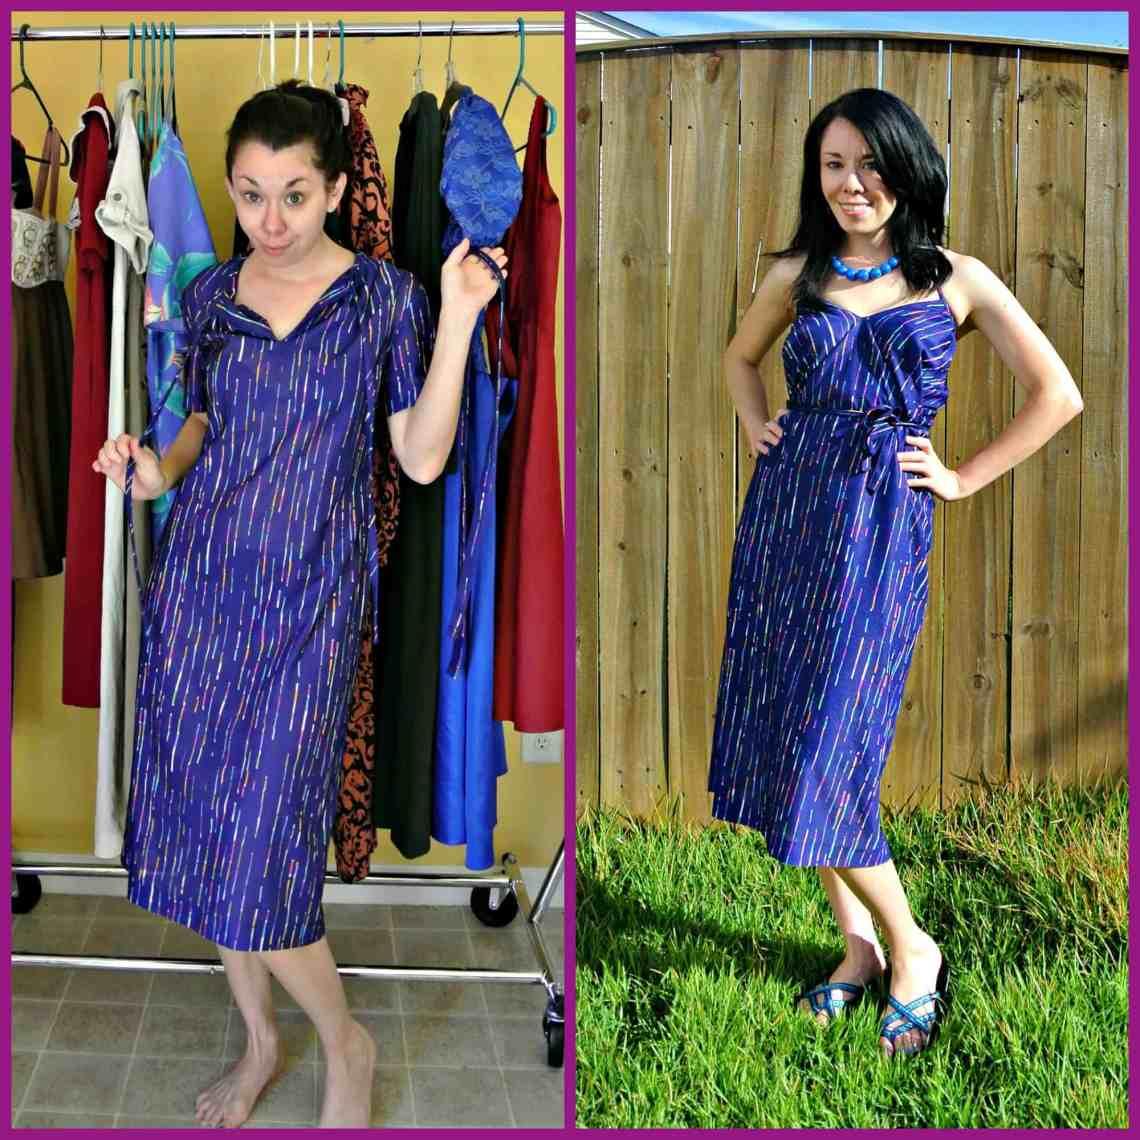 Spa Day Dress 1